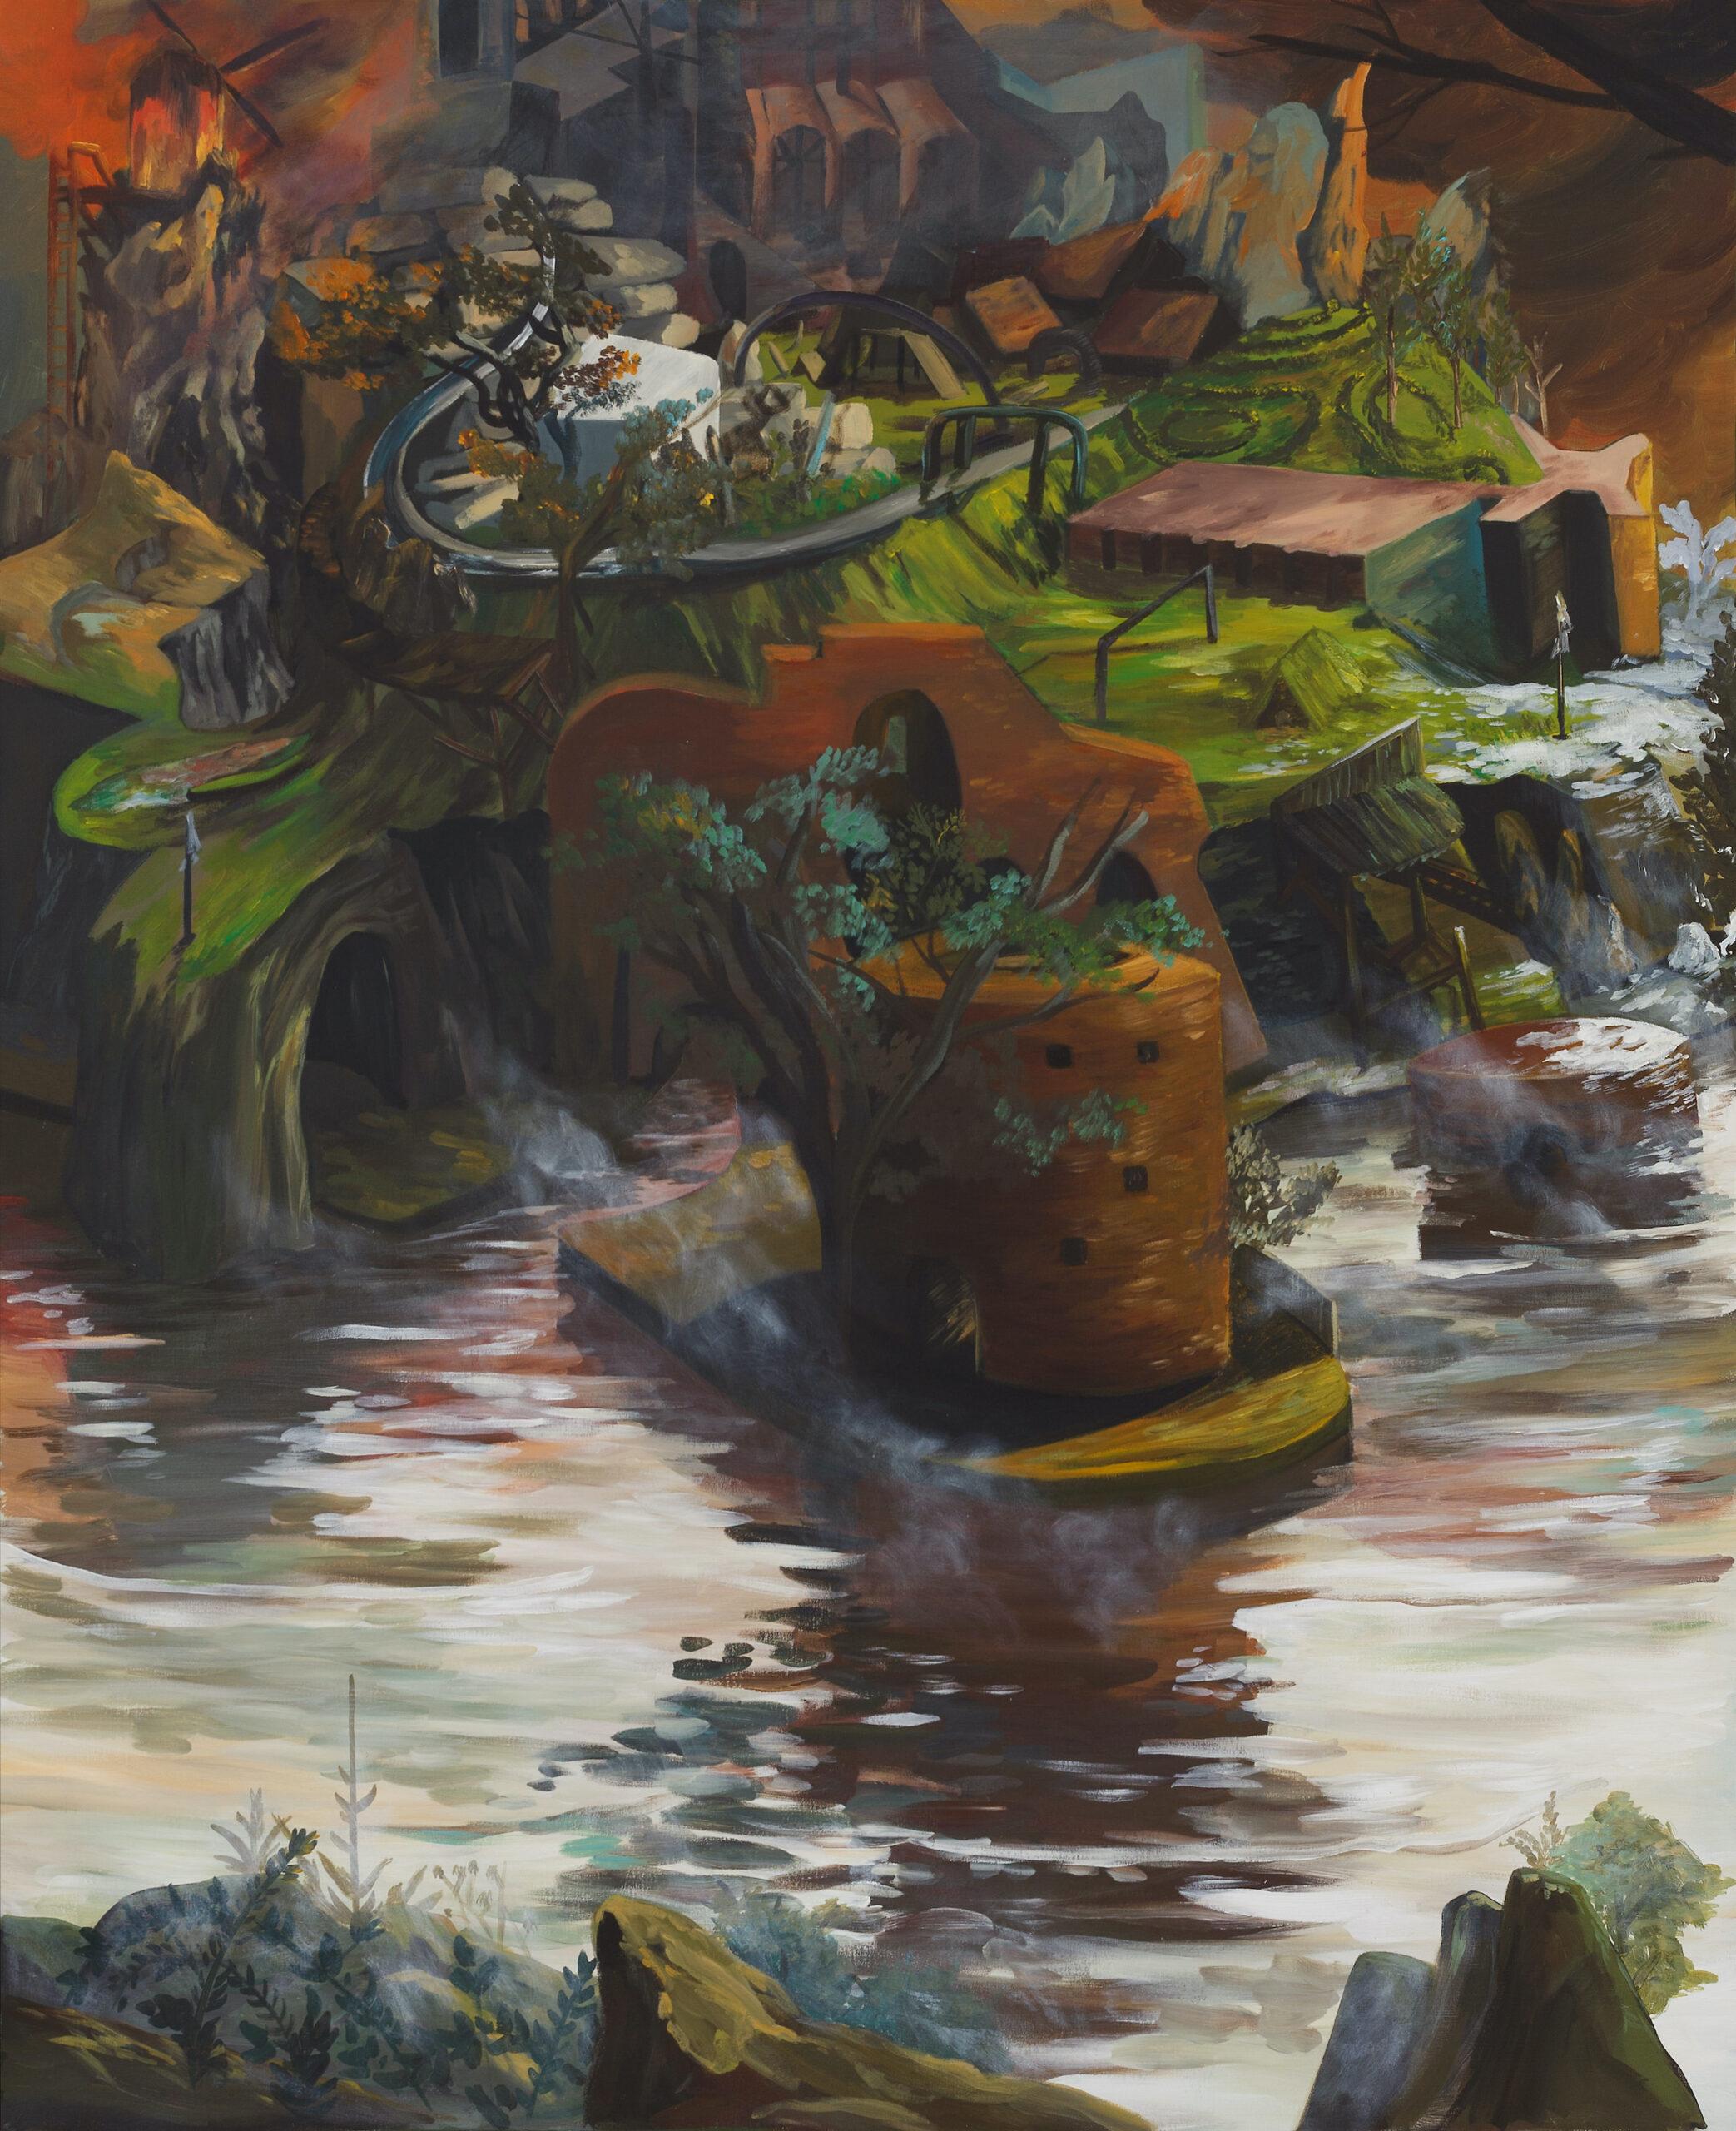 Ernesto Gutierrez Moya, I Found the Island (Panel 2 of 3), 2021